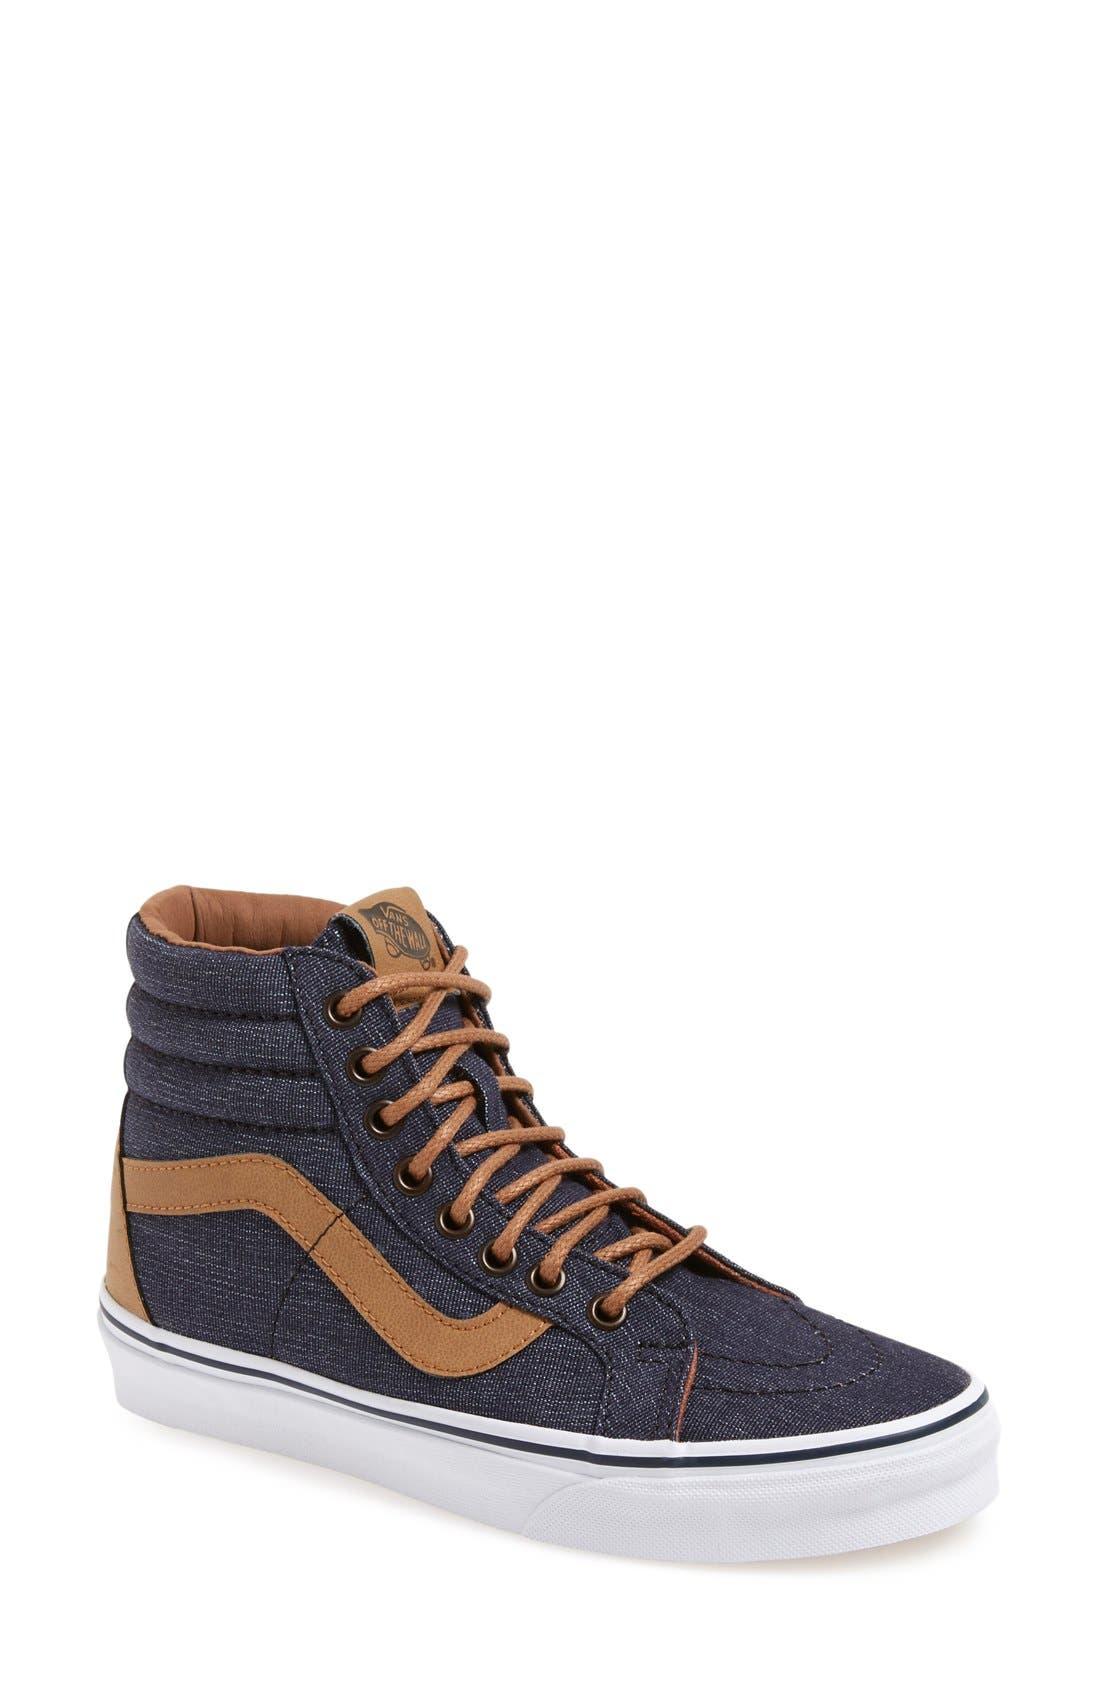 Main Image - Vans 'Sk8-Hi' Sneaker (Women)